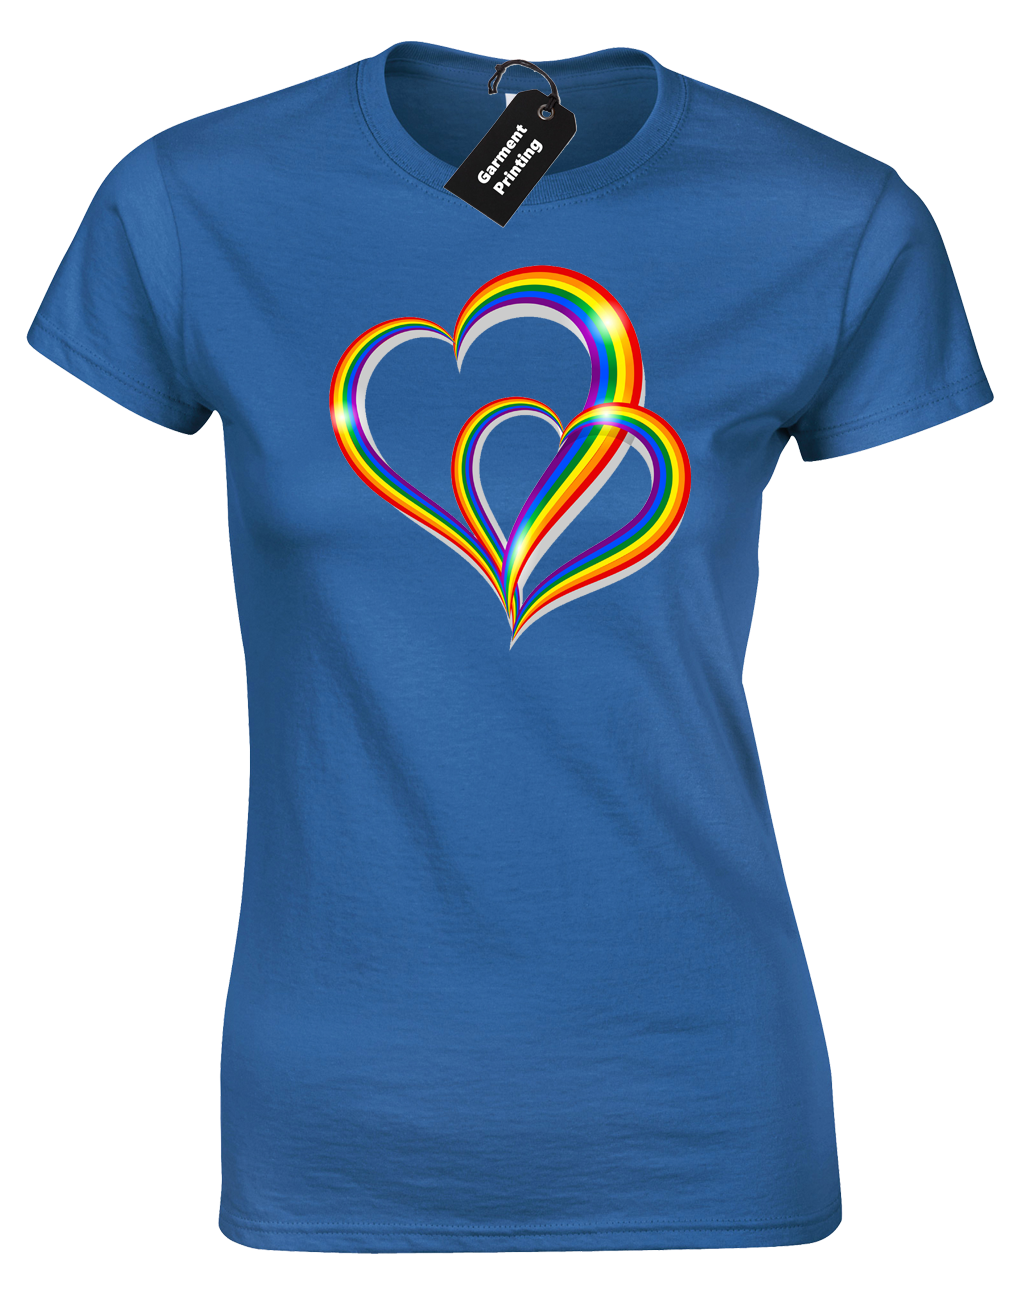 2 Pride Hearts Ladies T-Shirt Gay Lesbian Lgbt Unisex Rainbow Womens Top ( Col) 10